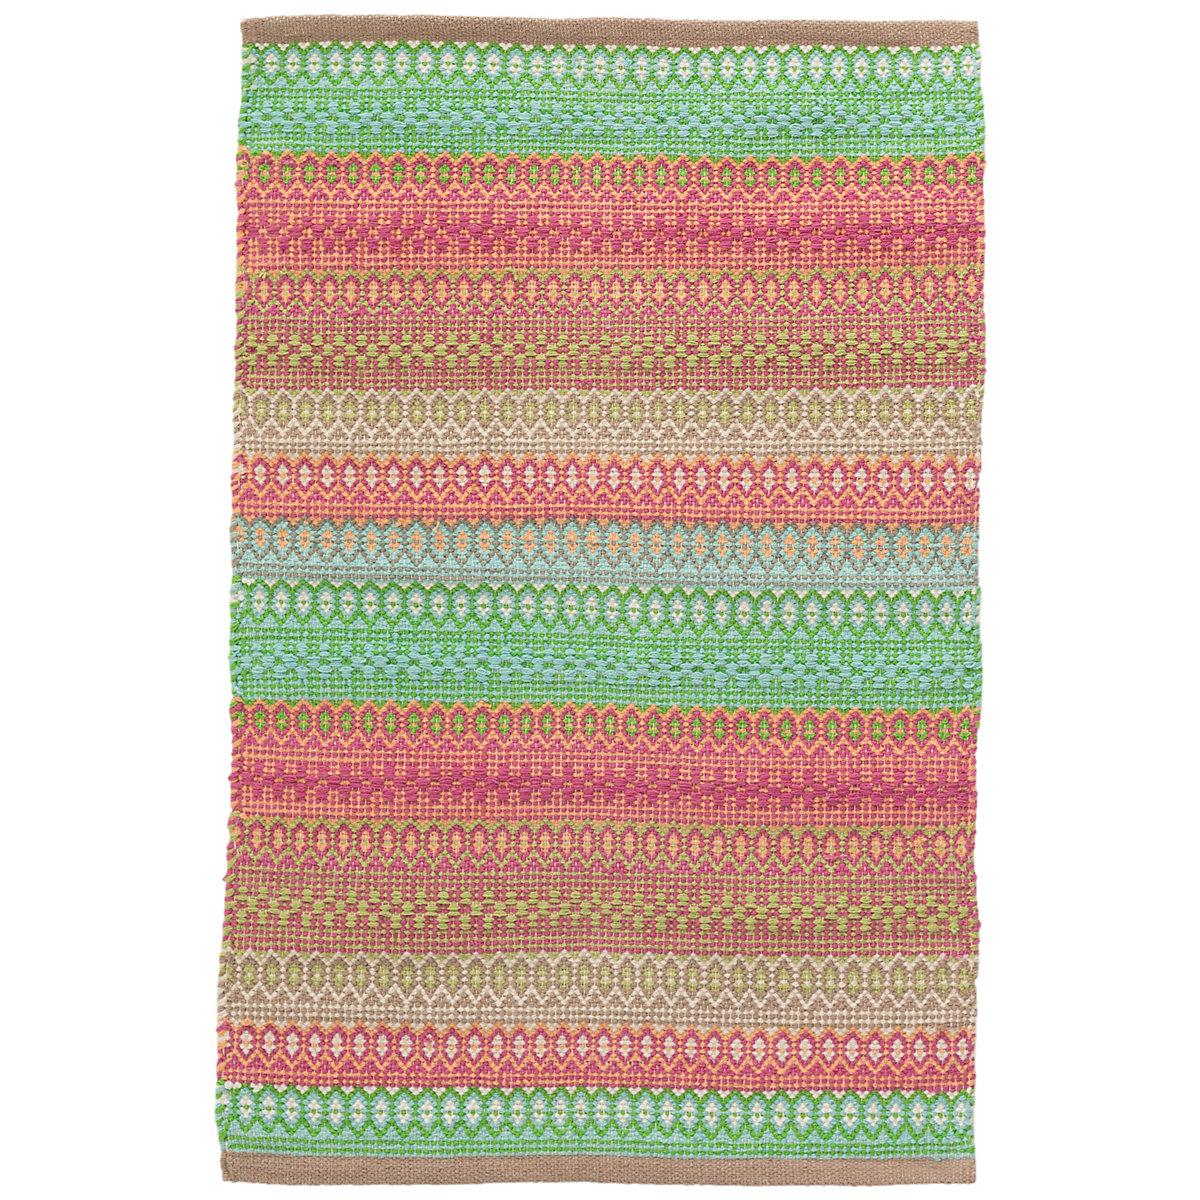 Gypsy Stripe Turquoise Grey Woven Cotton Rug: Gypsy Stripe Pink/Green Woven Cotton Rug